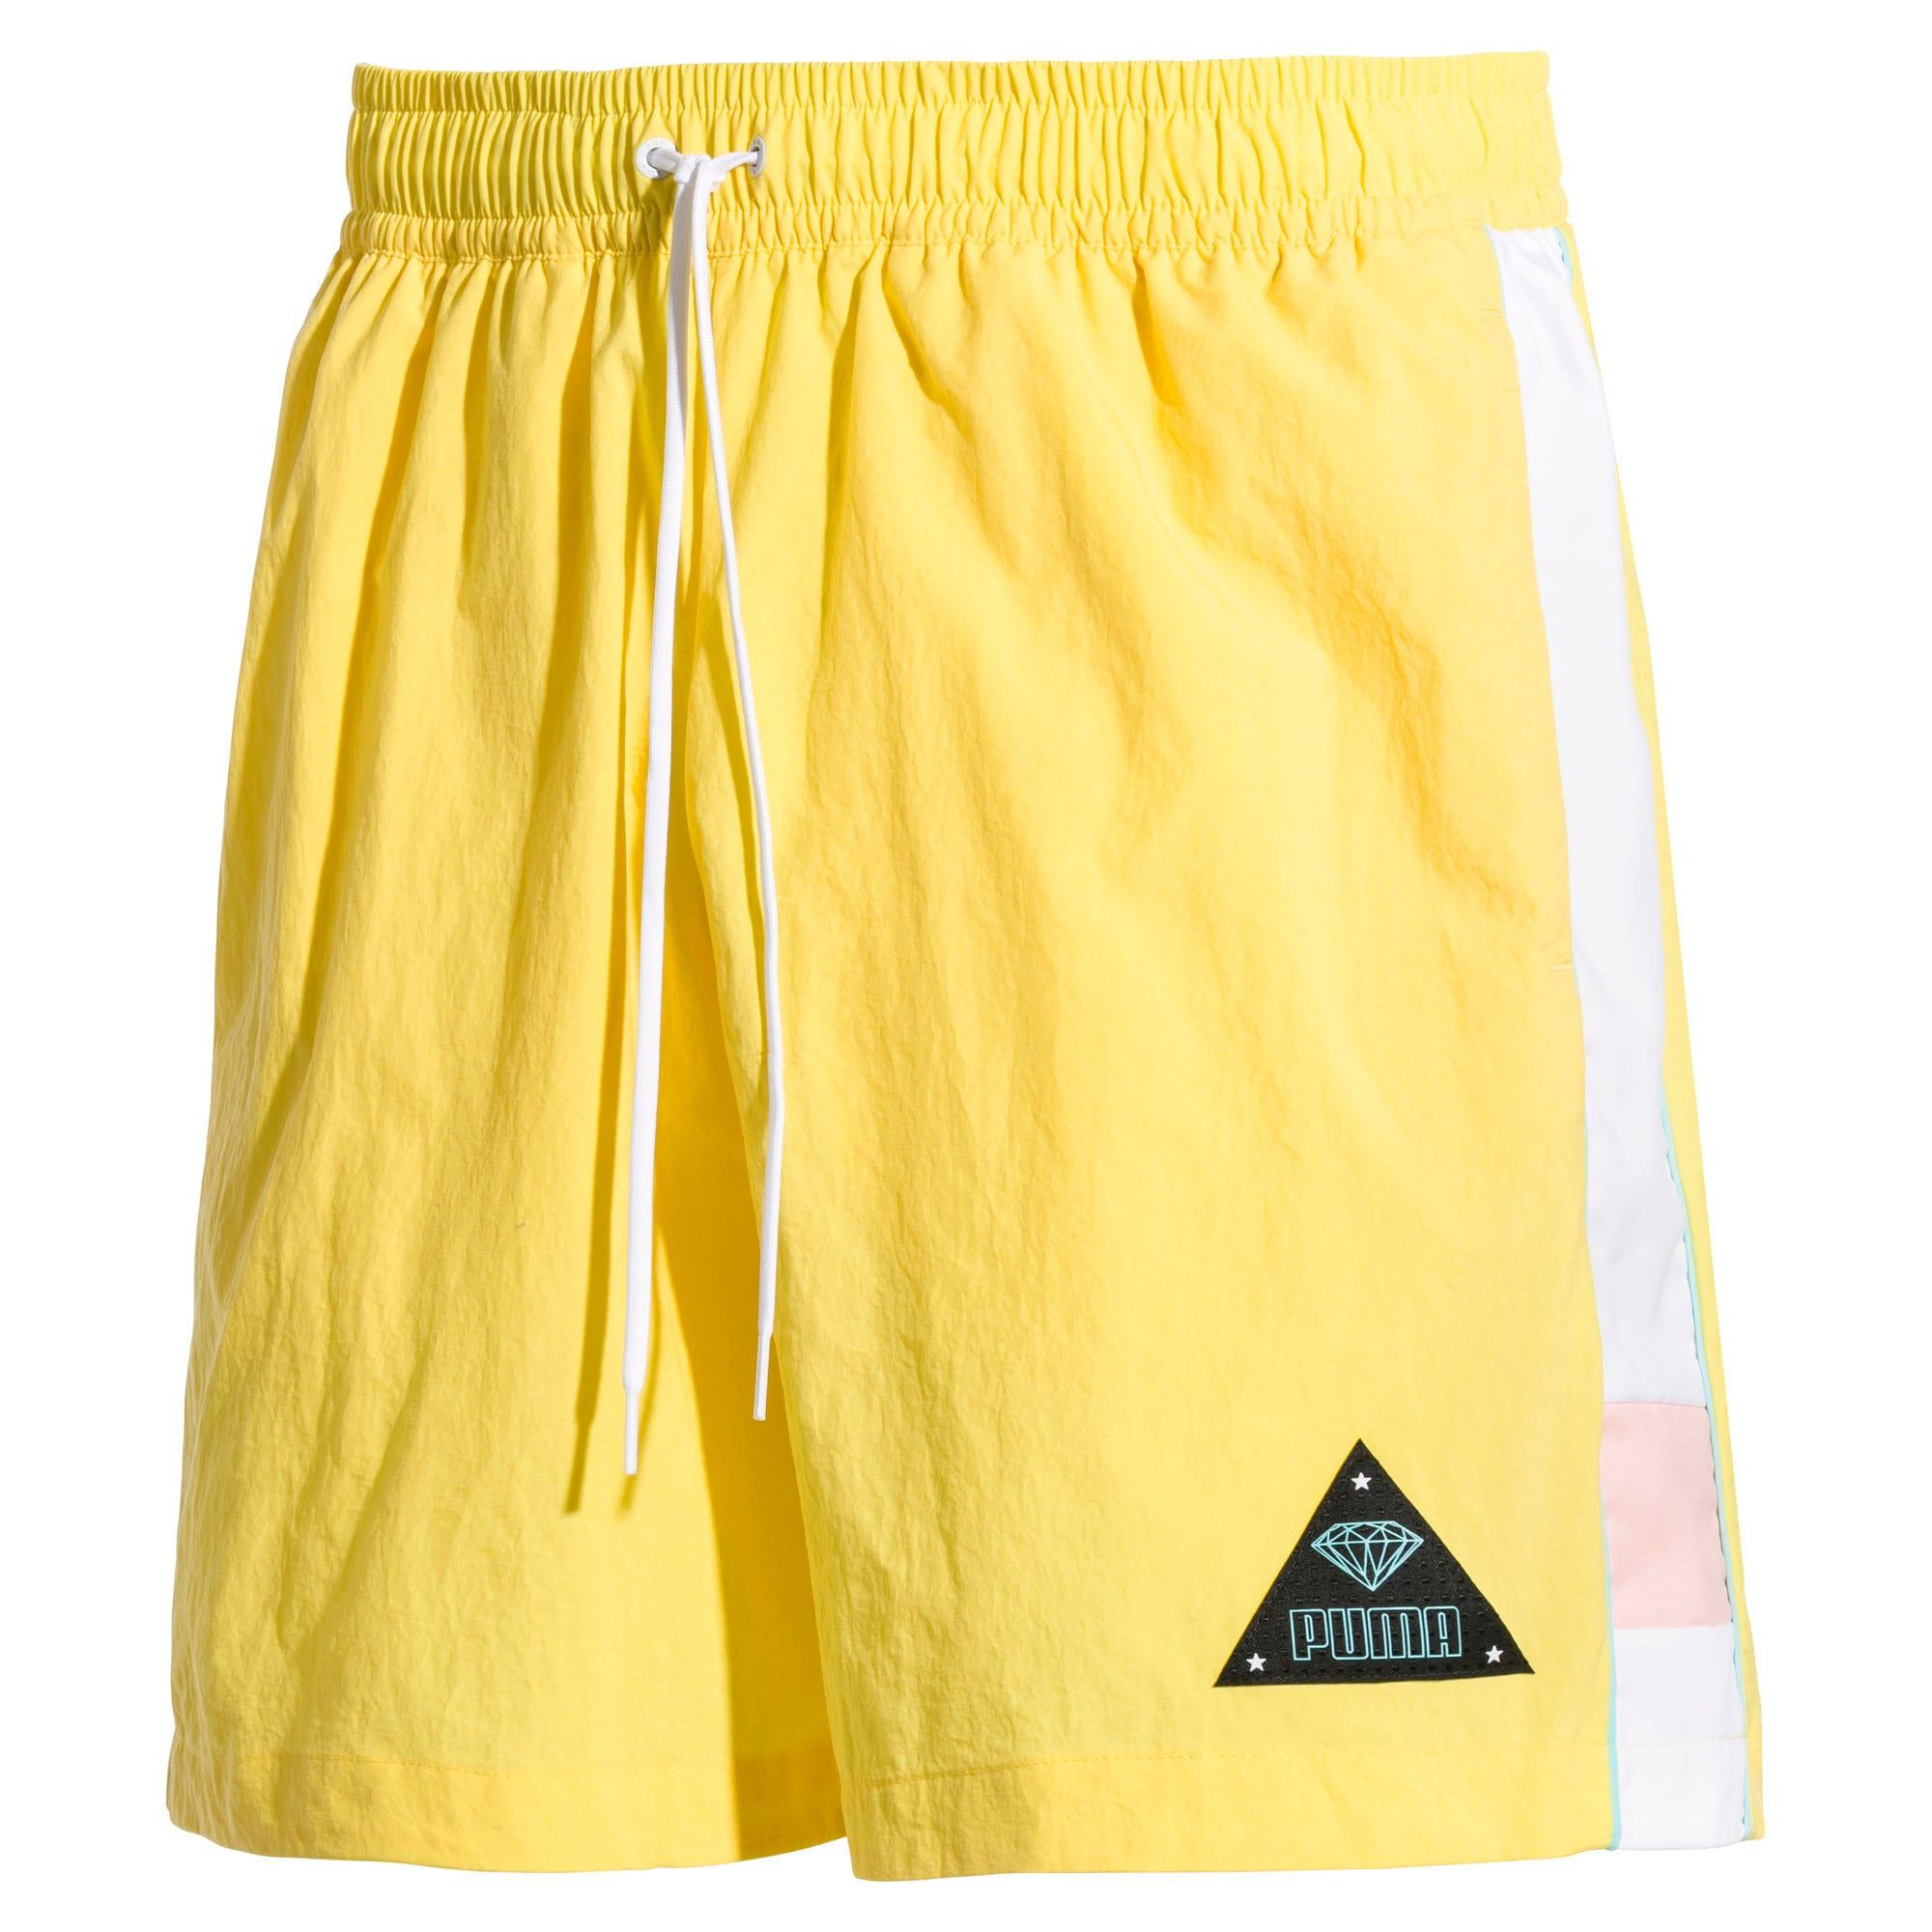 Thumbnail 1 of PUMA x DIAMOND Men's Shorts, Lemon Zest, medium